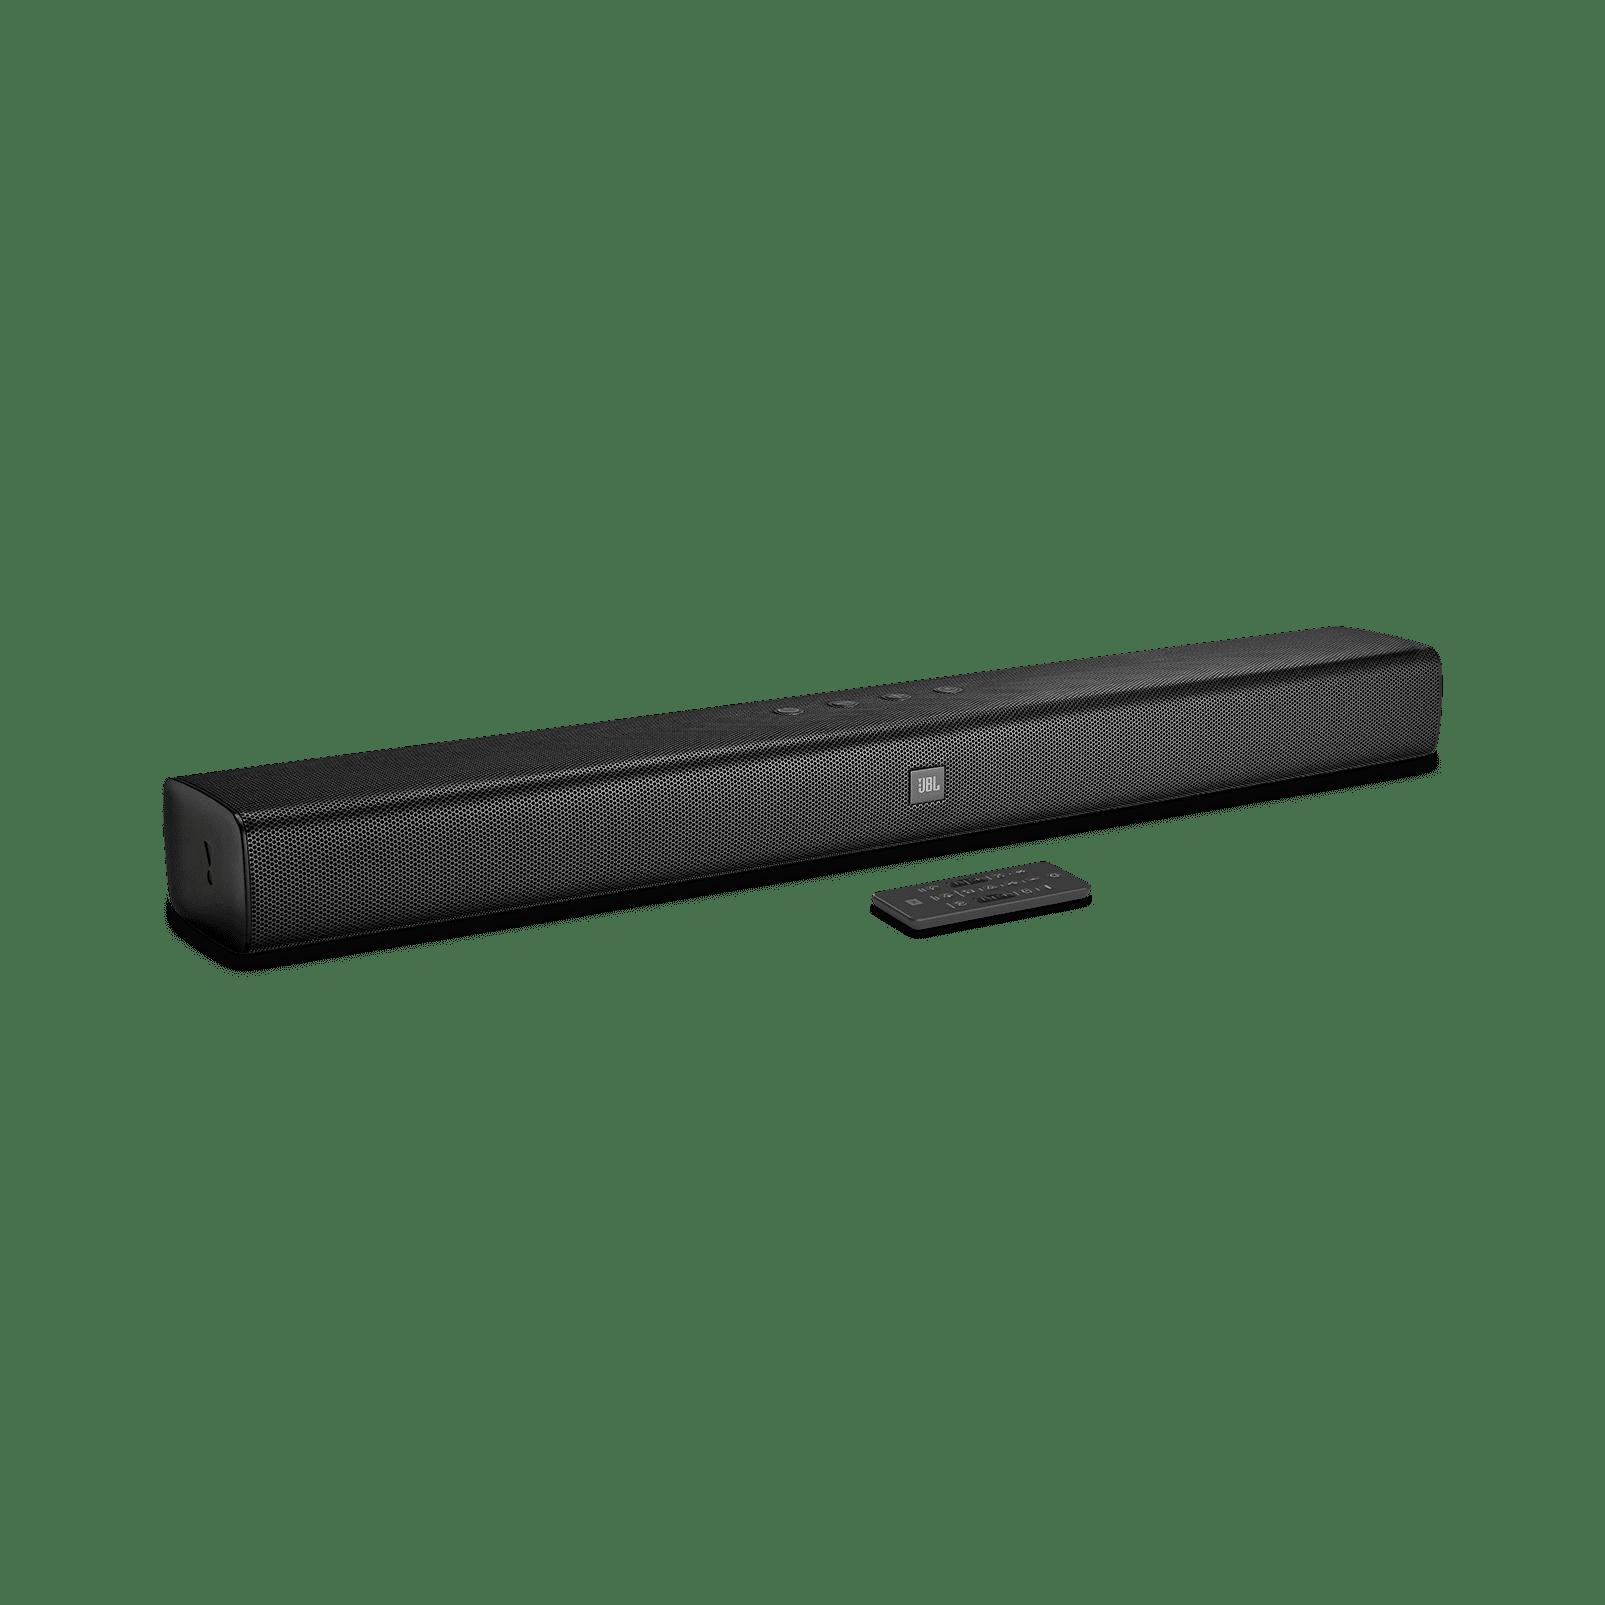 JBL 2.0 Channel Soundbar with Bluetooth (Black) by JBL